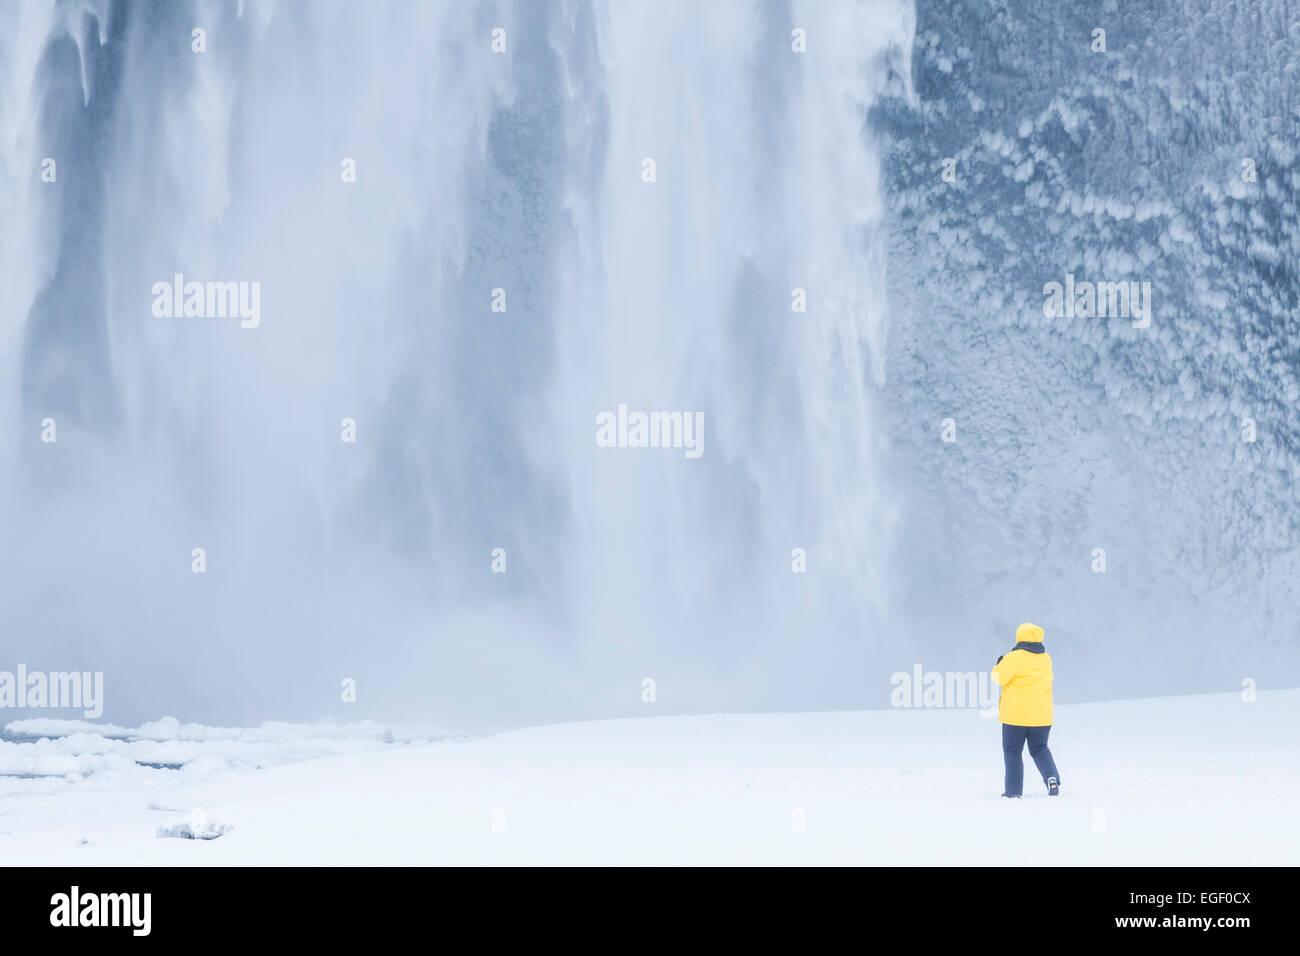 Frau Tourist in gelben Jacke am Skogafoss Wasserfall im Winter Skogar Süd-Island-Island-Europa Stockbild